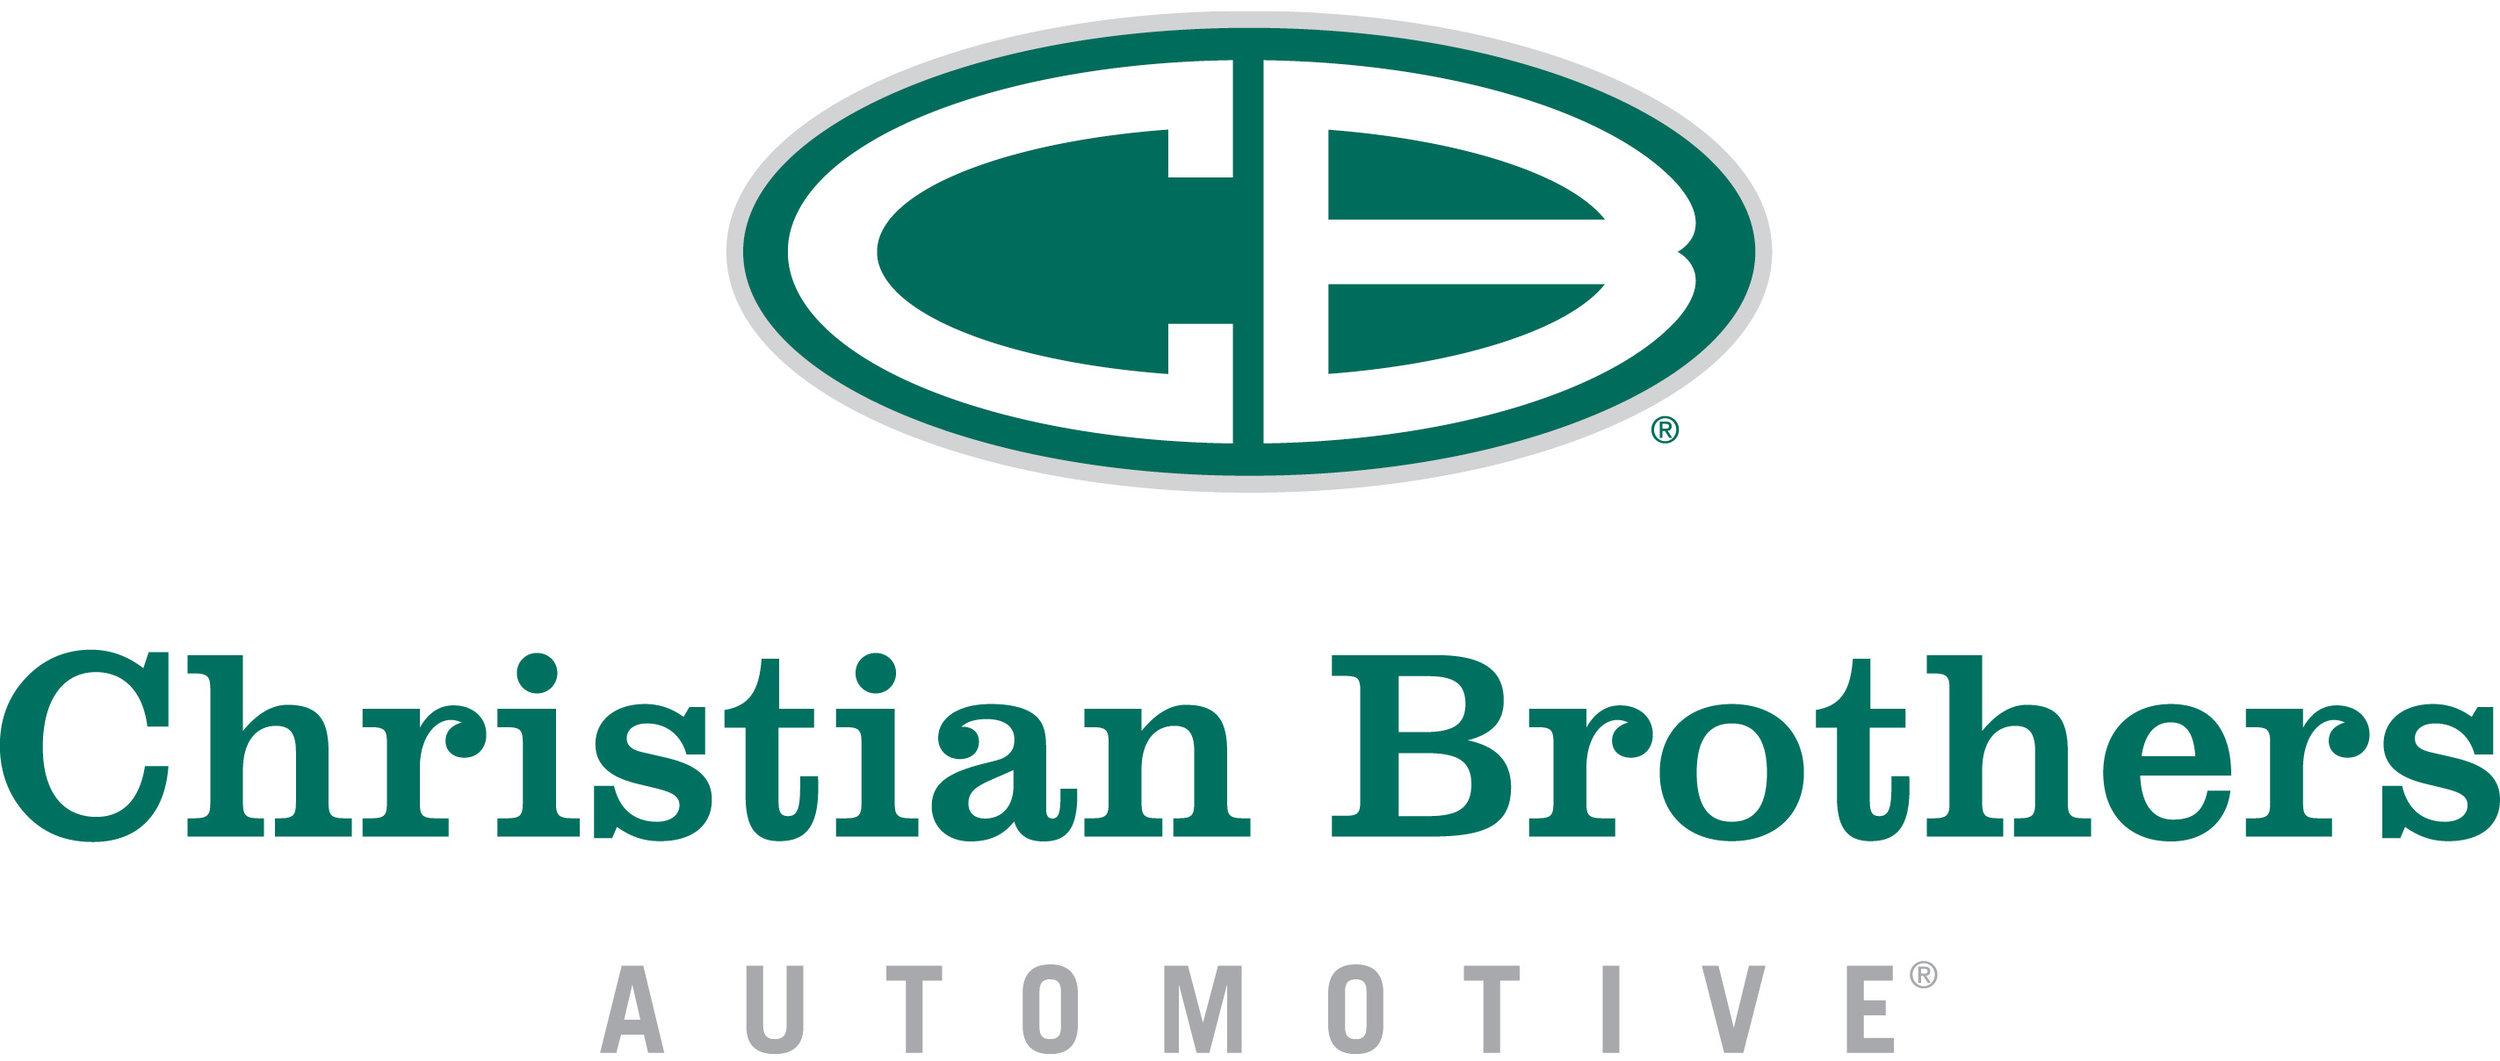 ChristianBrothers_Standard_RGB_RT.jpg